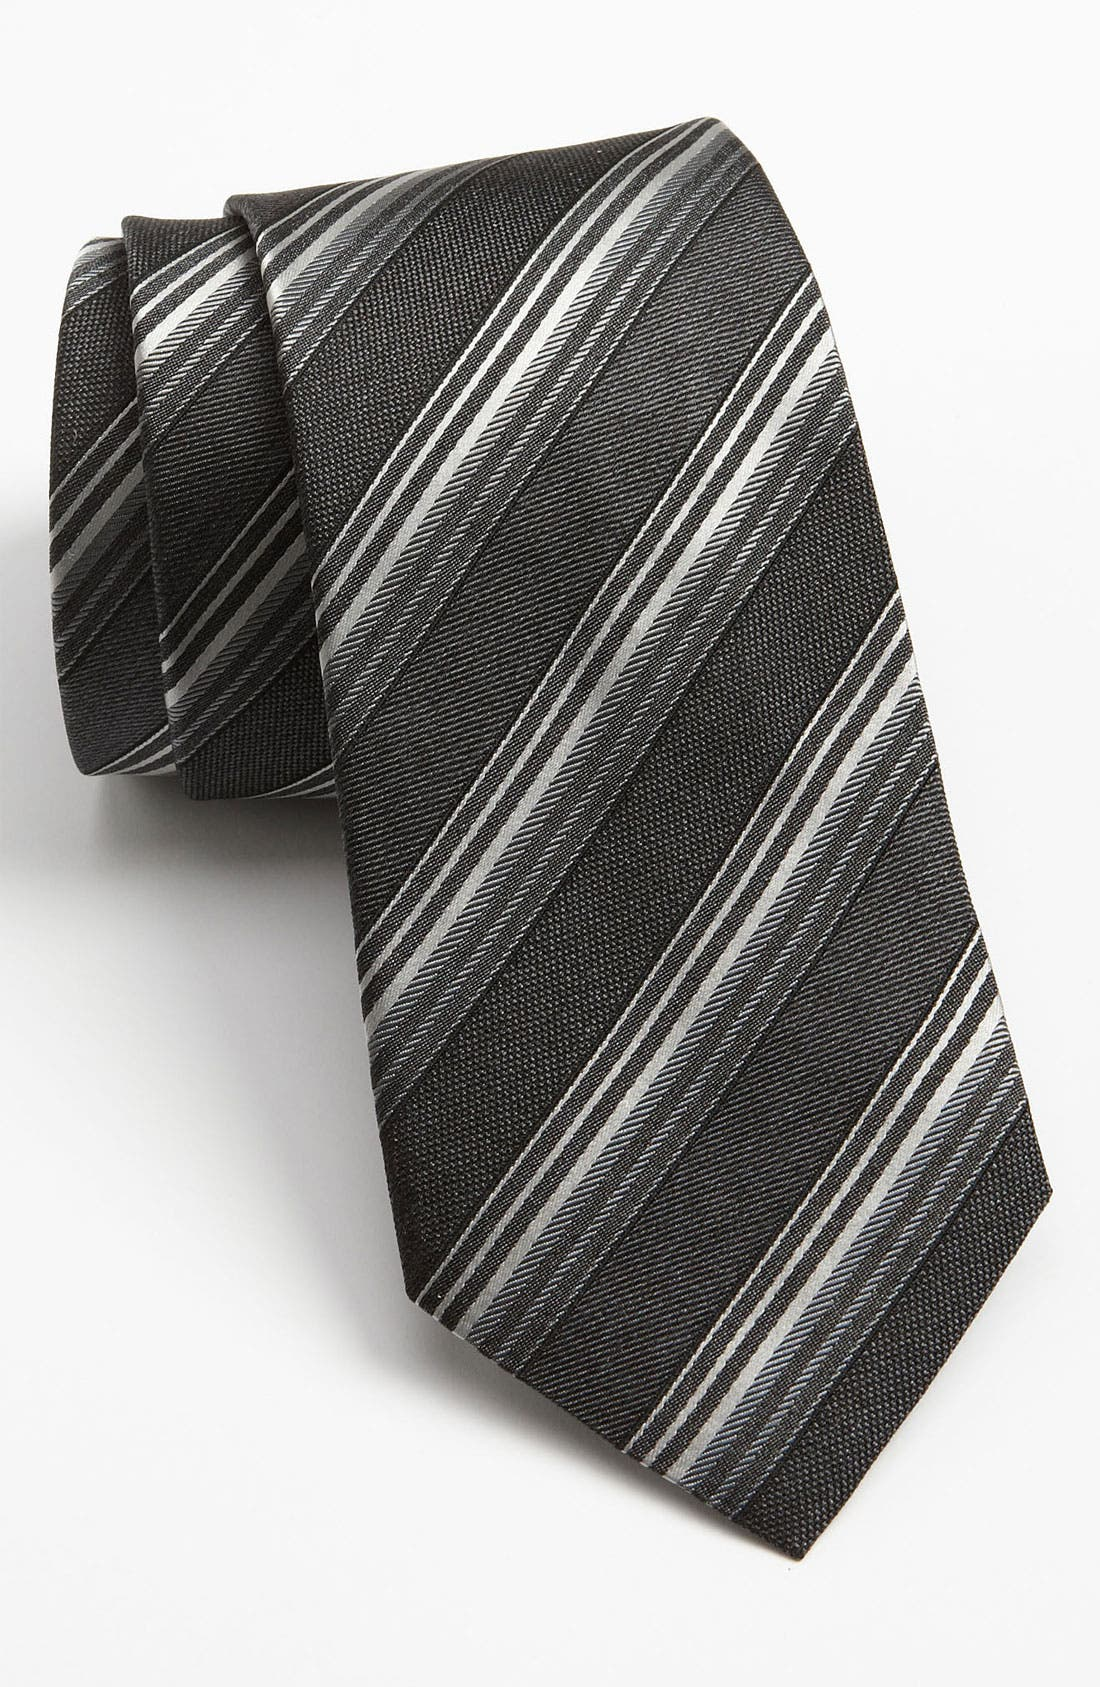 Alternate Image 1 Selected - Z Zegna Woven Tie